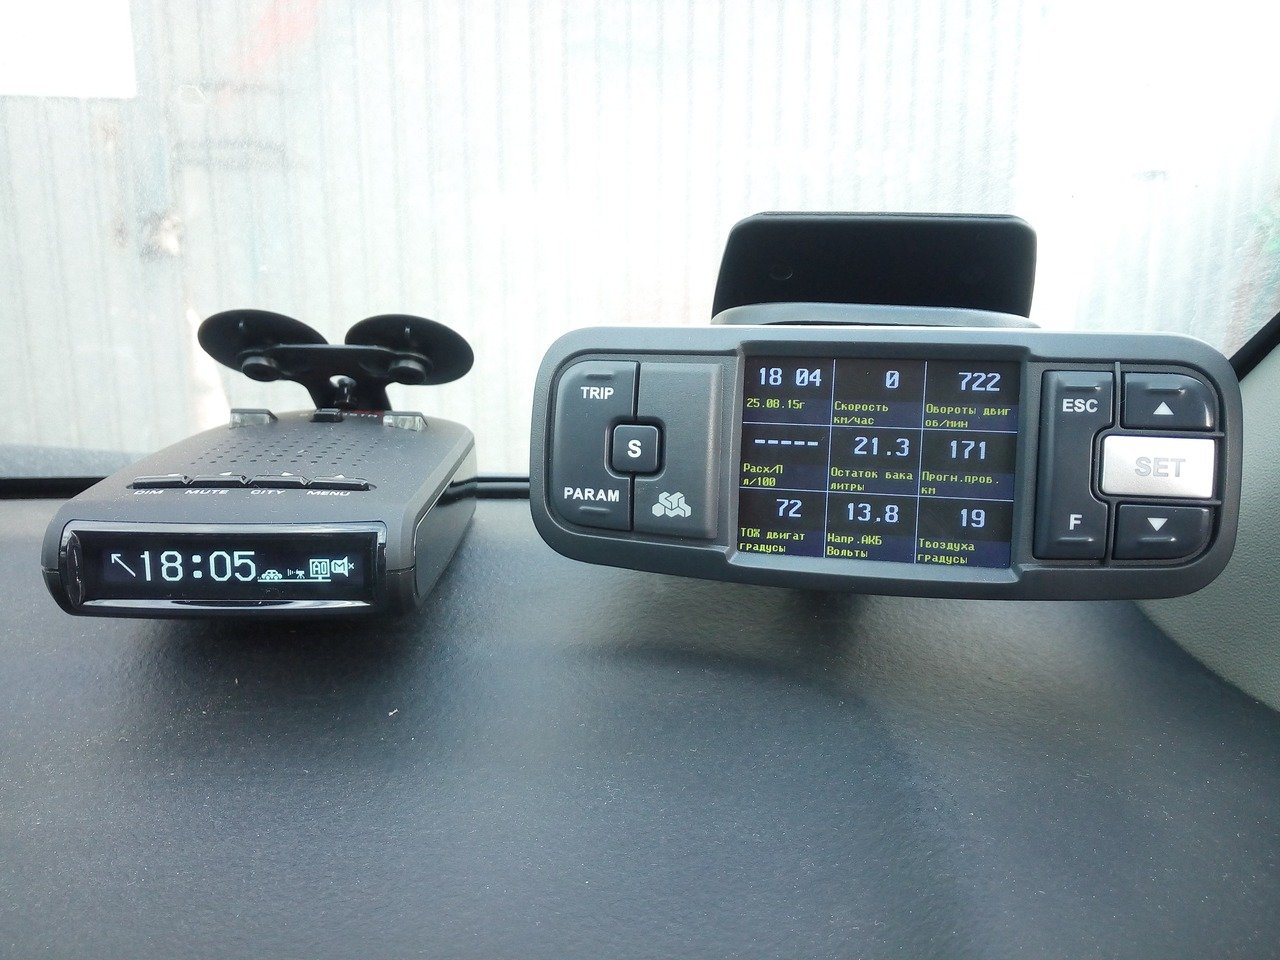 антирадар Sho-Me 900 и бортовой компьютер Multitronics VC731